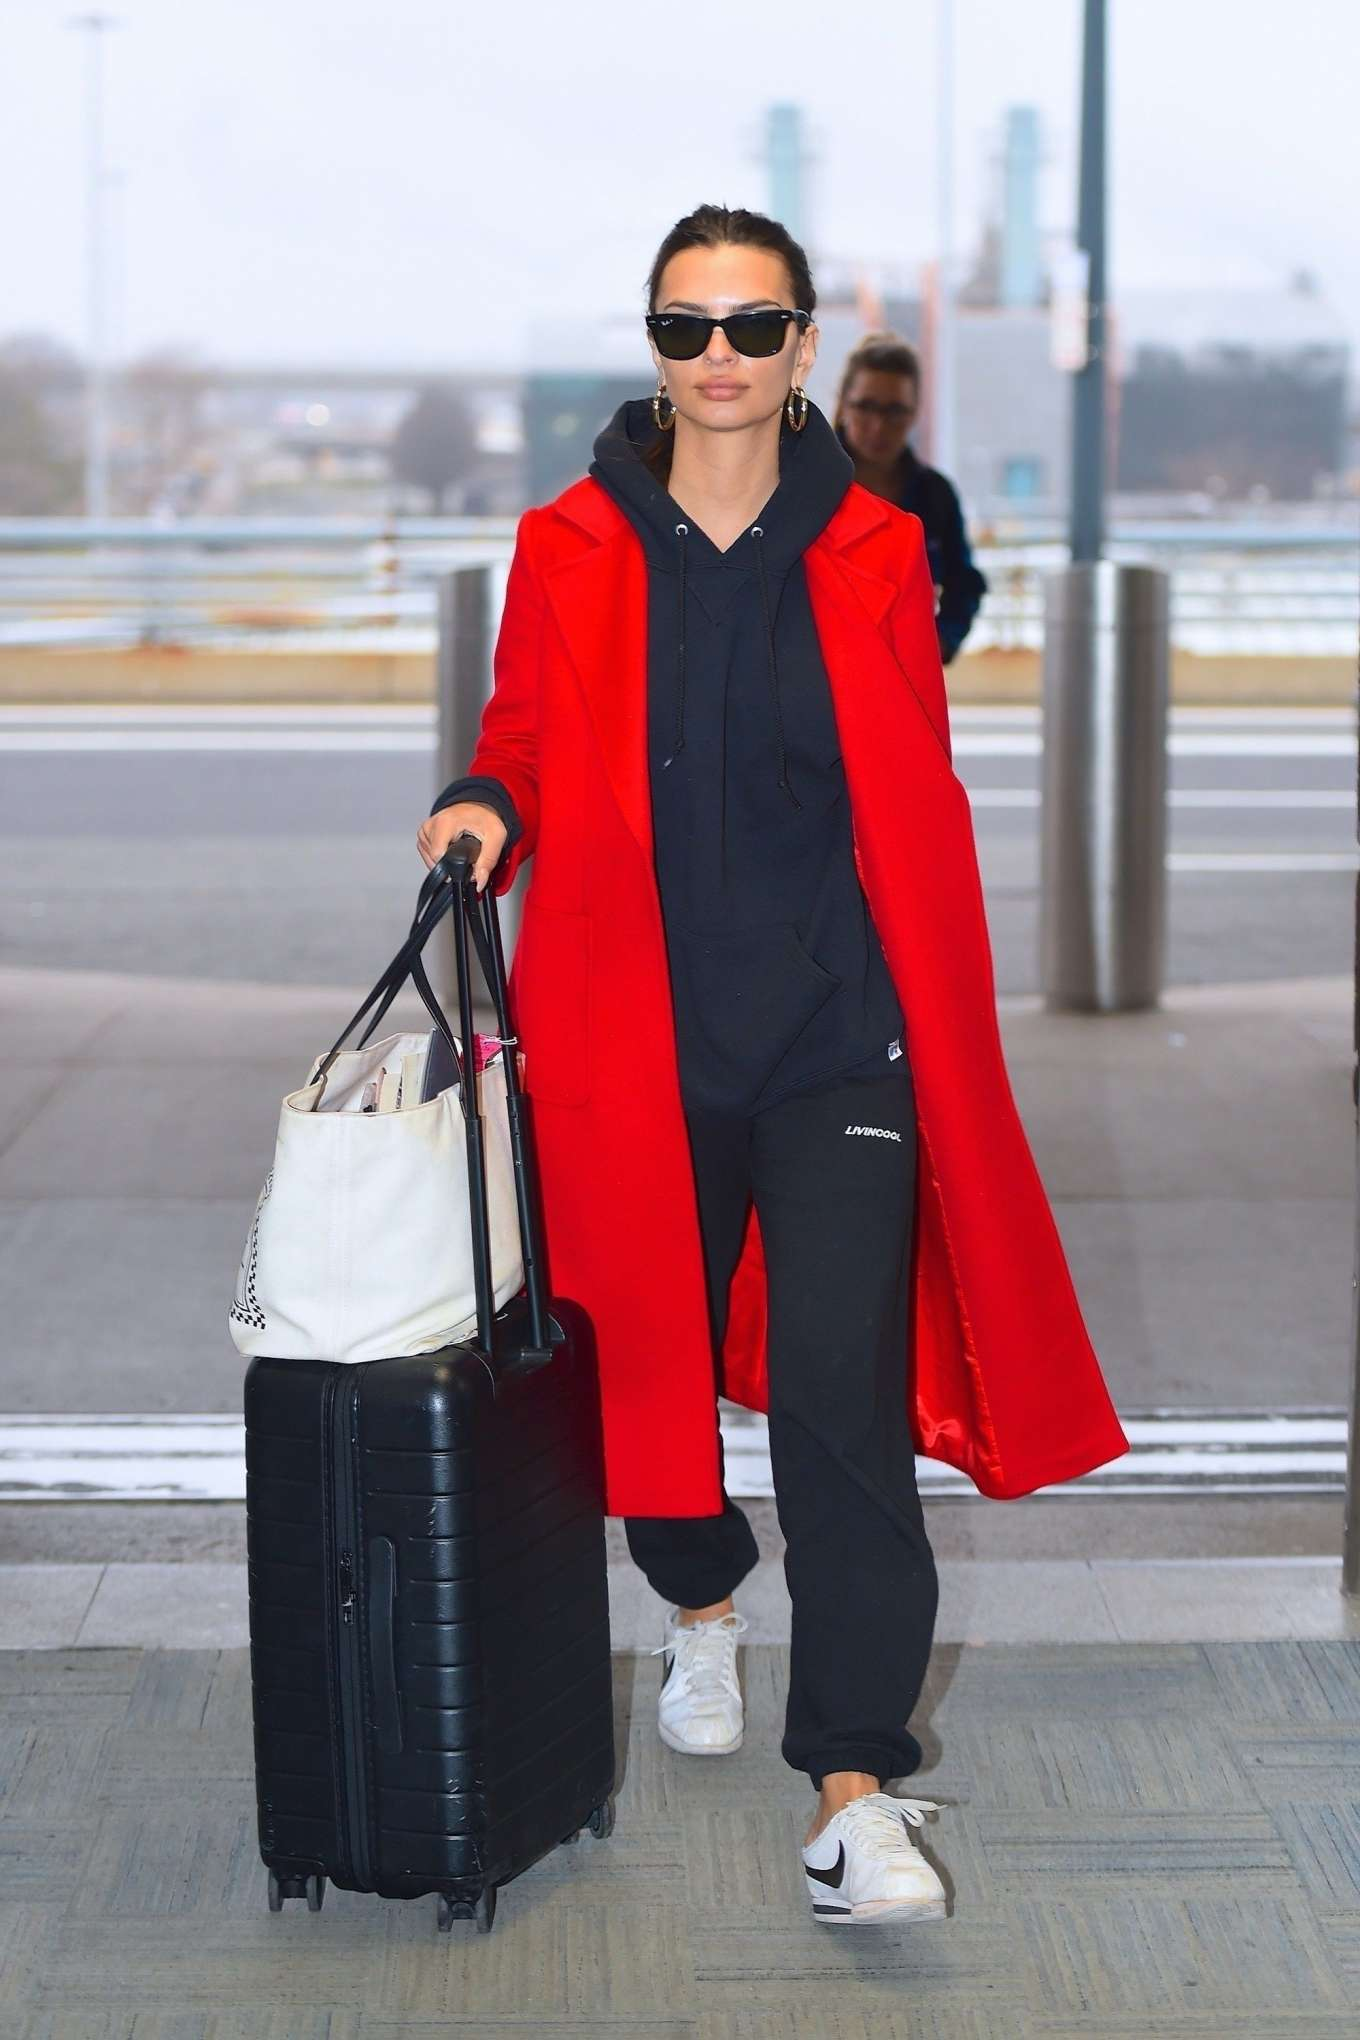 Emily Ratajkowski 2020 : Emily Ratajkowski in red coat ready for flight at JFK airport-09